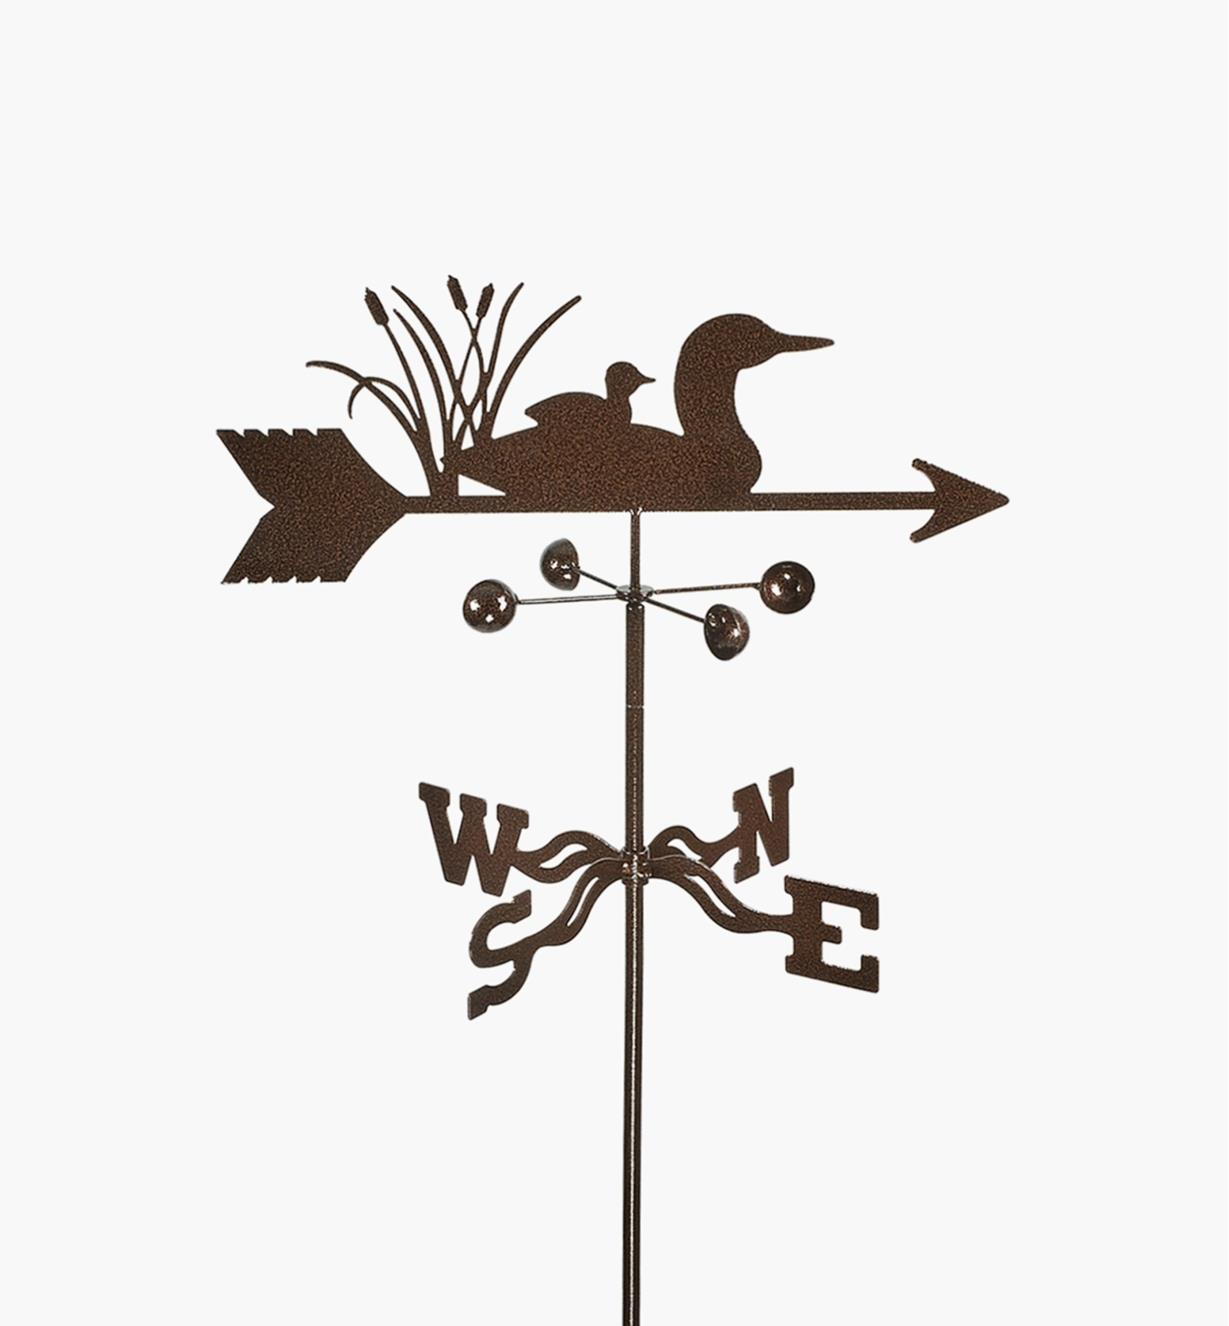 Girouette Décorative Pour Le Jardin - Huard pour Girouette De Jardin